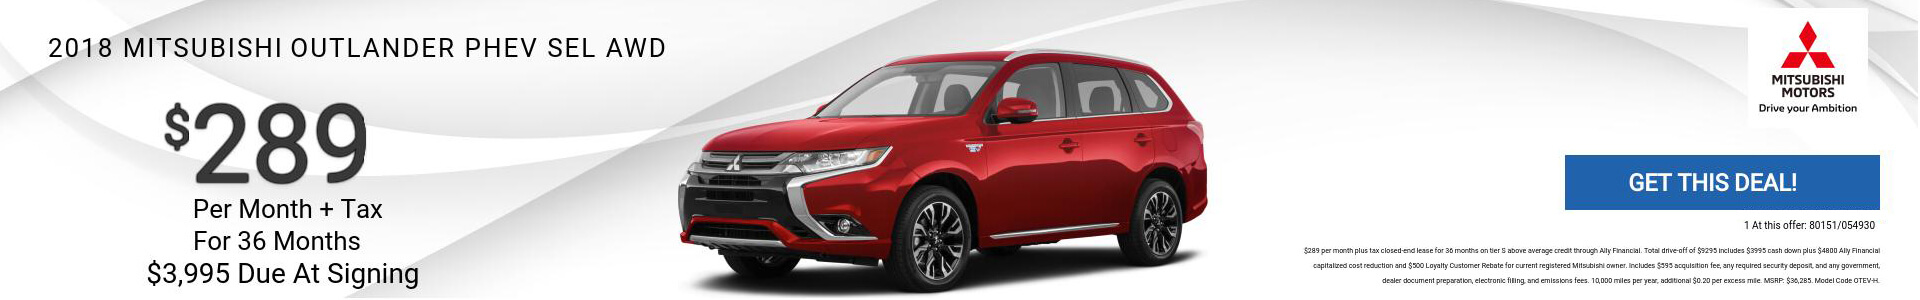 Mitsubishi Outlander PHEV $289 Lease